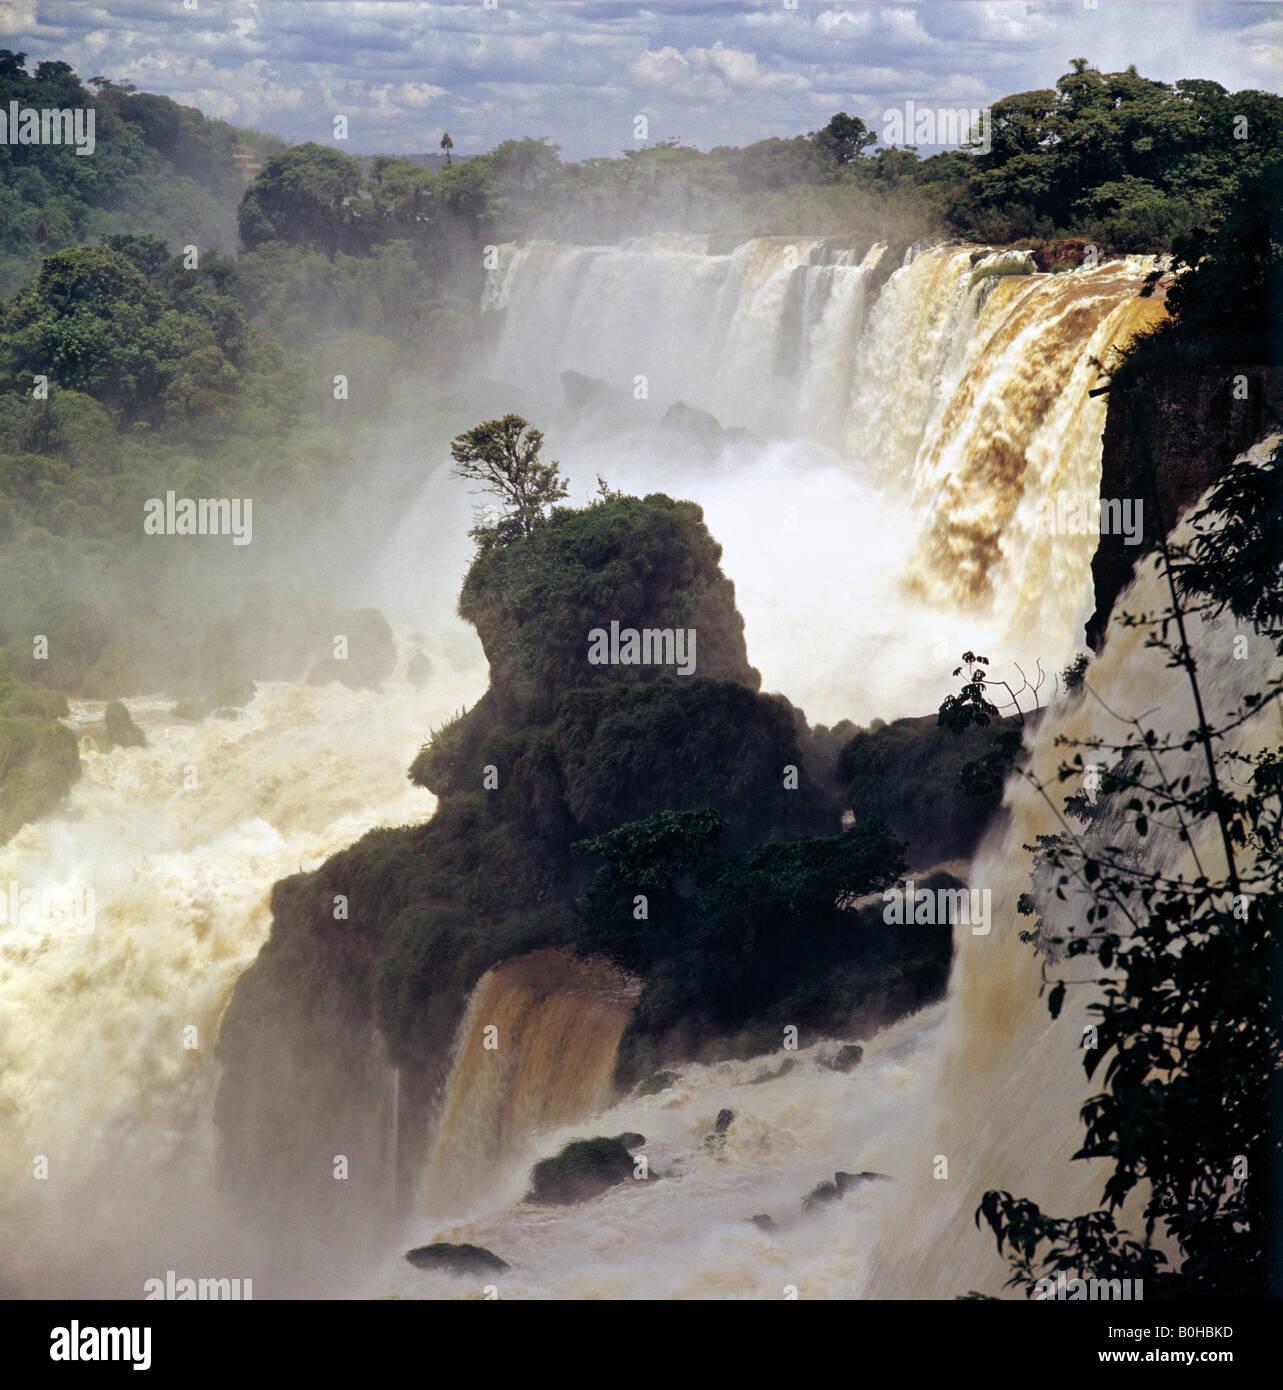 Iguazu Falls, UNESCO World Heritage Site, Argentina, South America - Stock Image